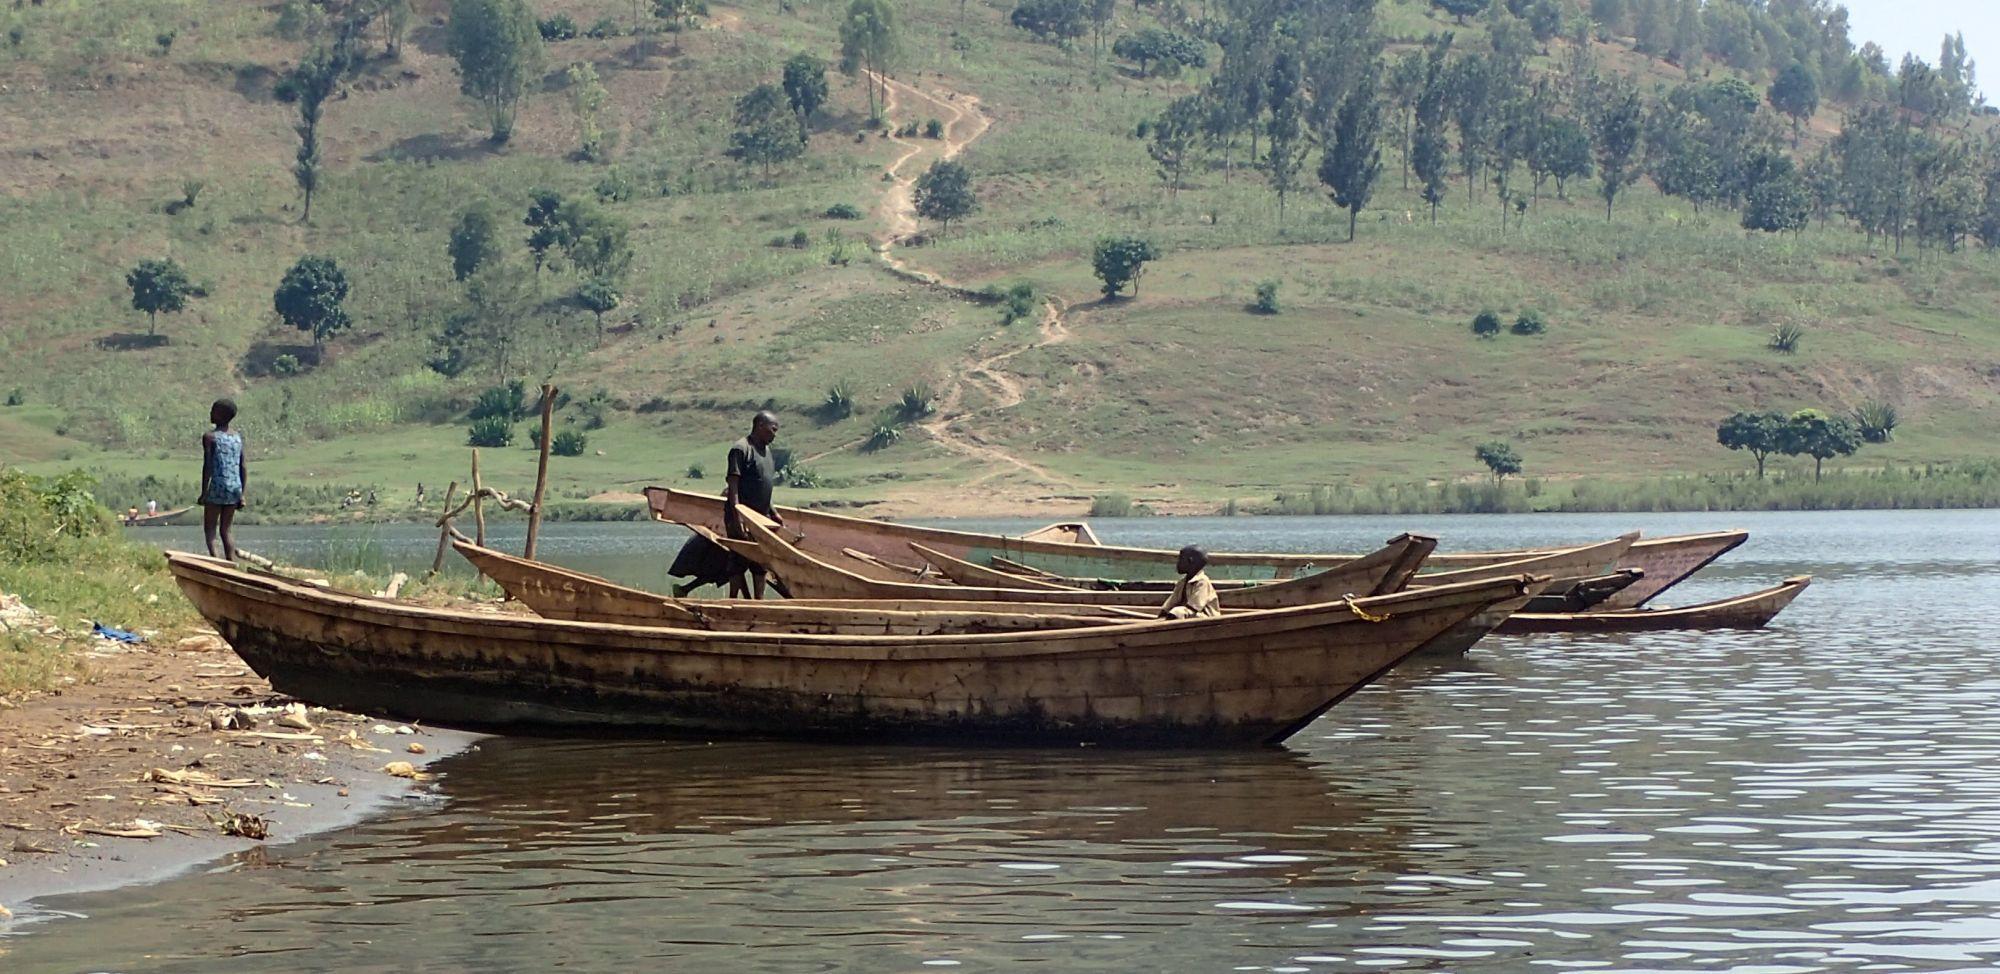 Fishermen's Boats on Lake Kivu